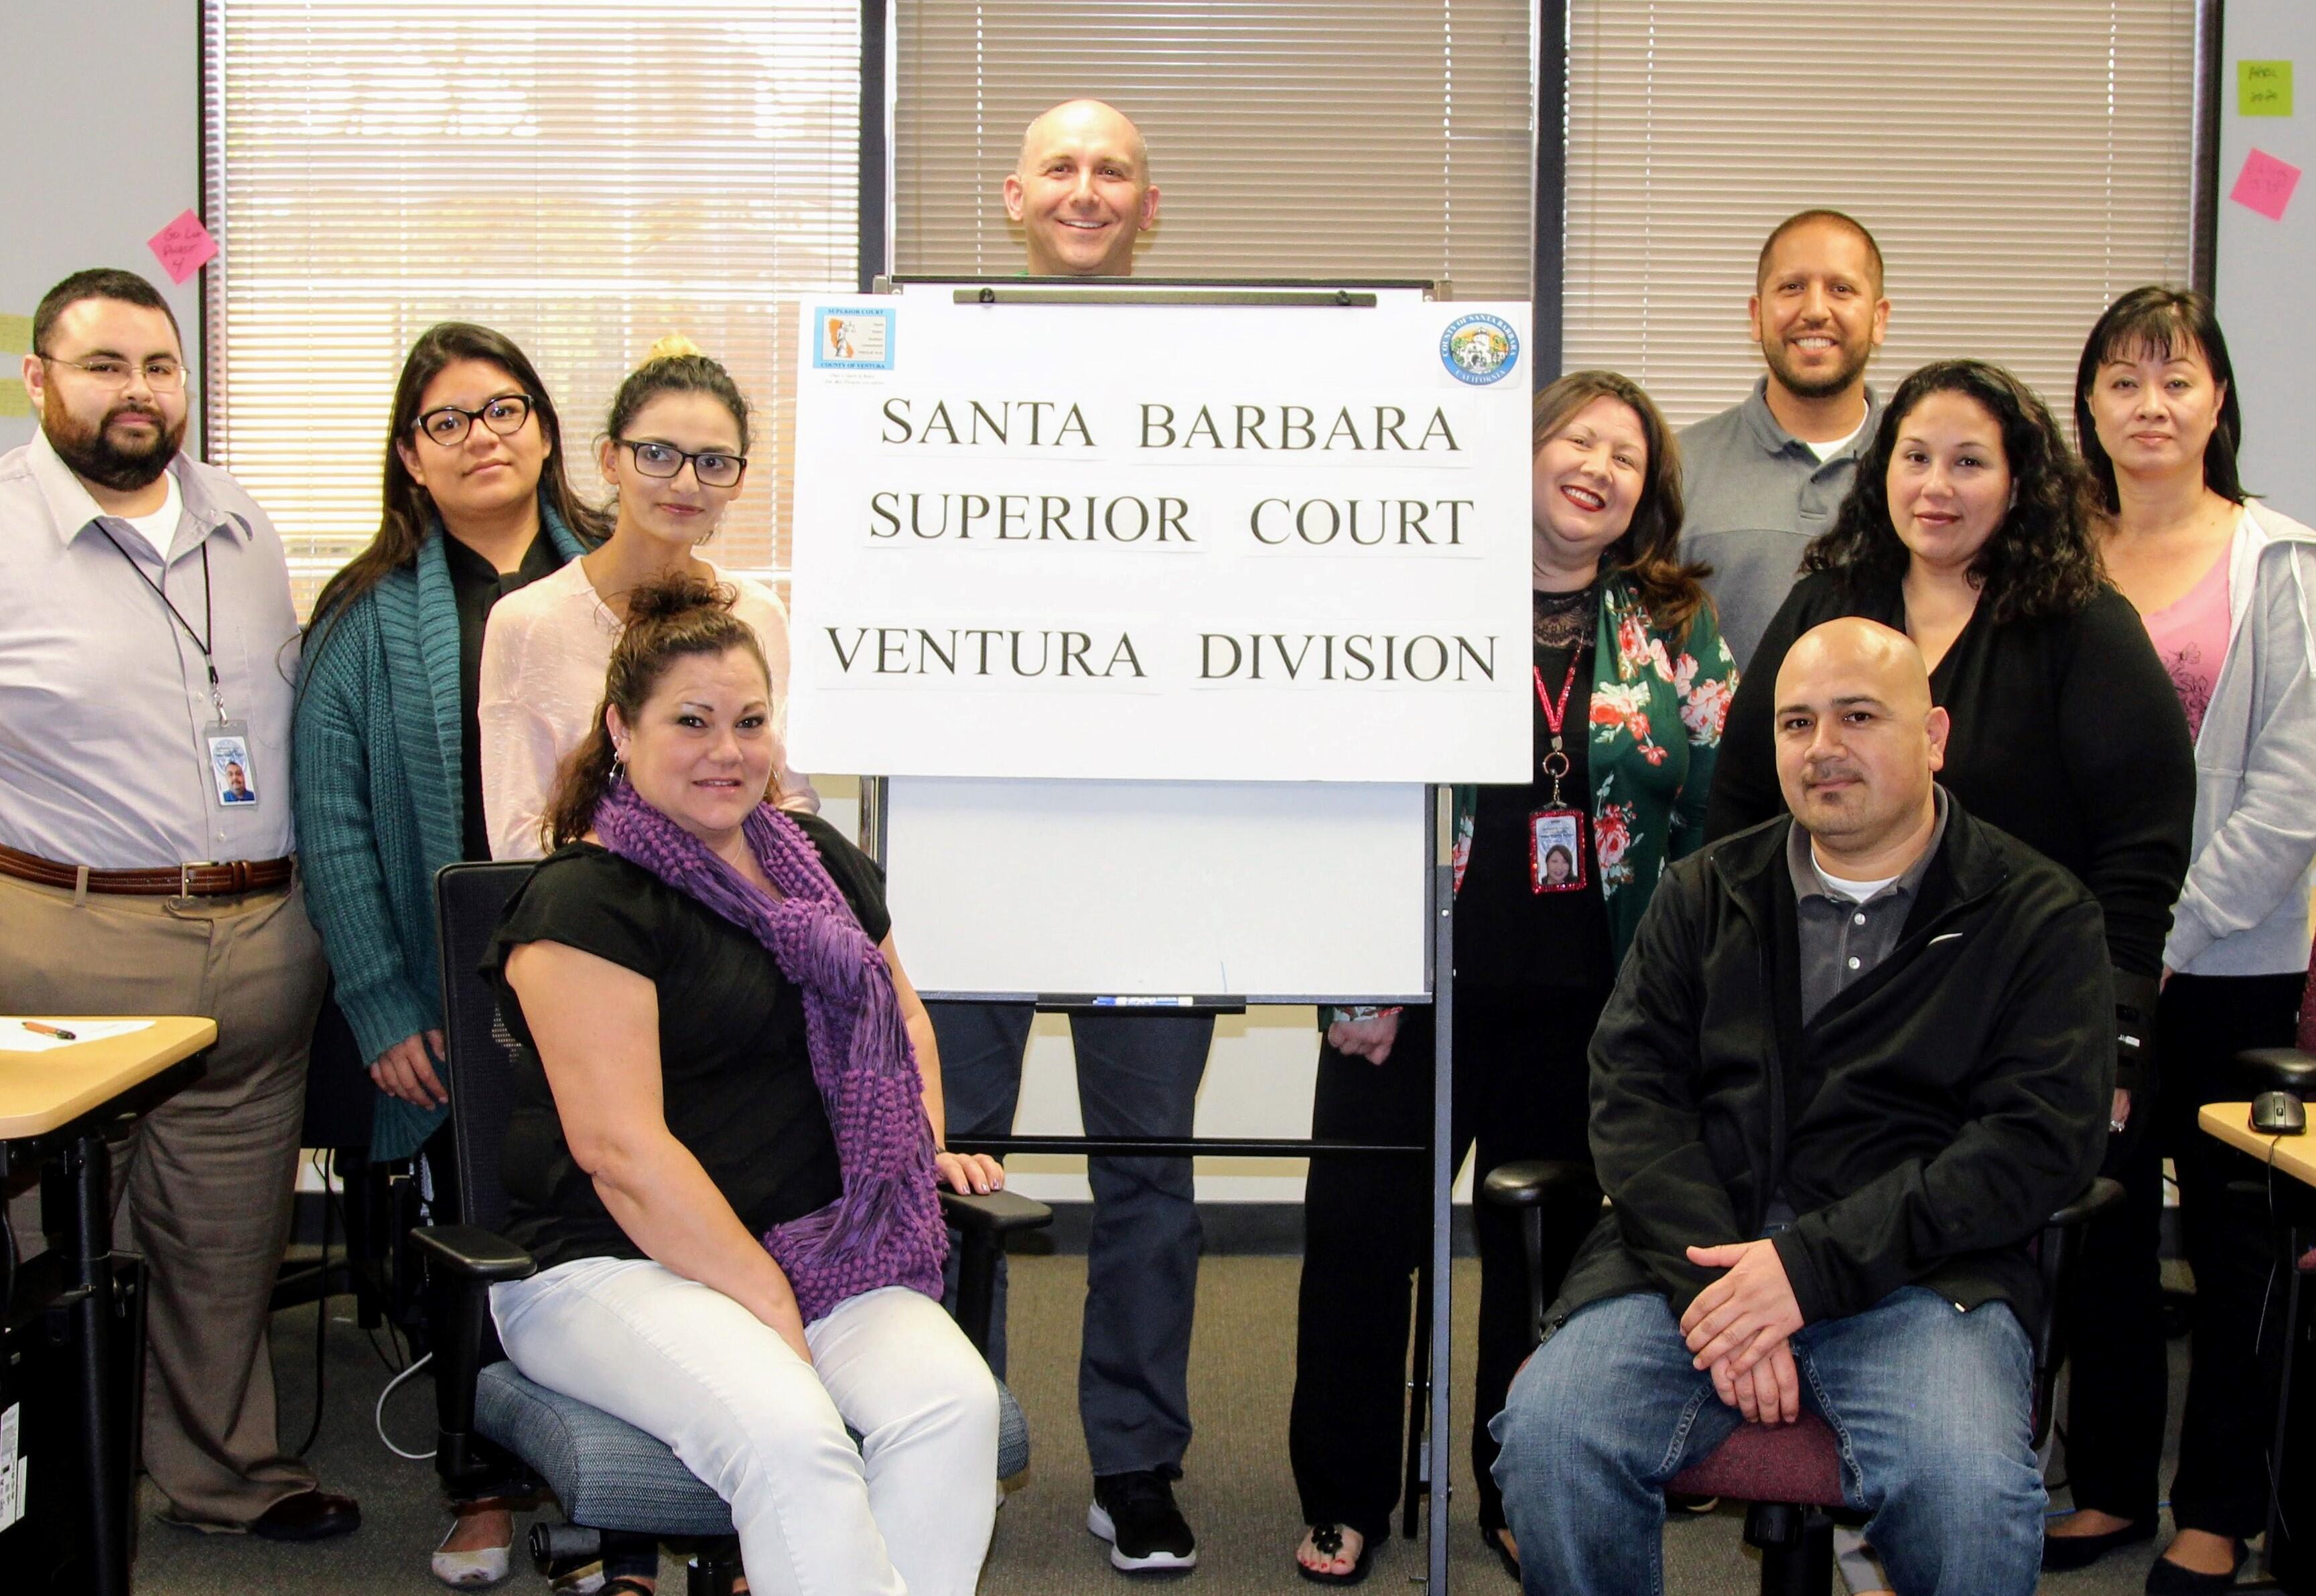 Santa Barbara employees